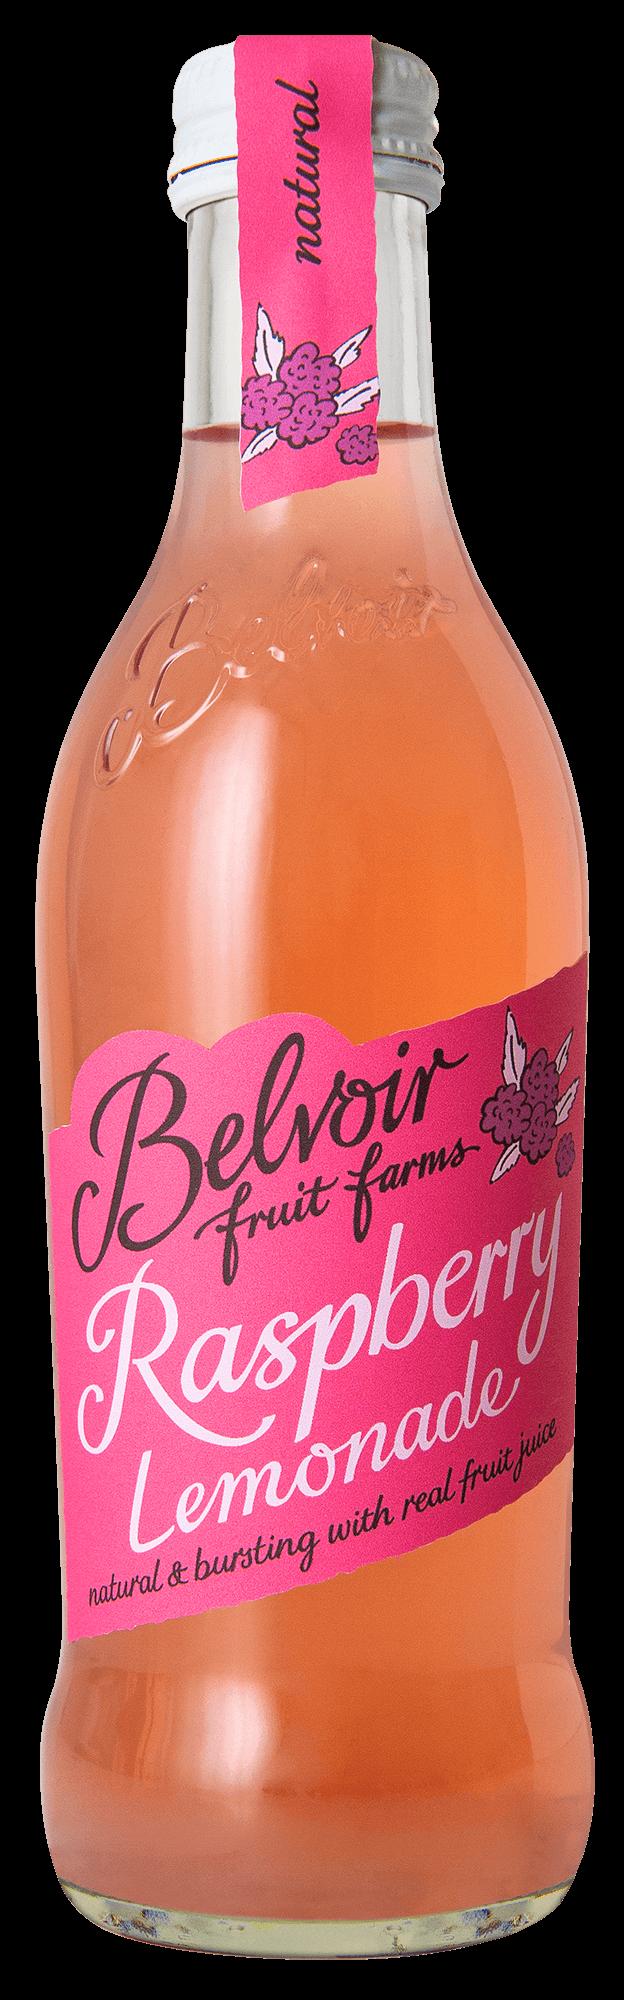 Belvoir Raspberry Lemonade